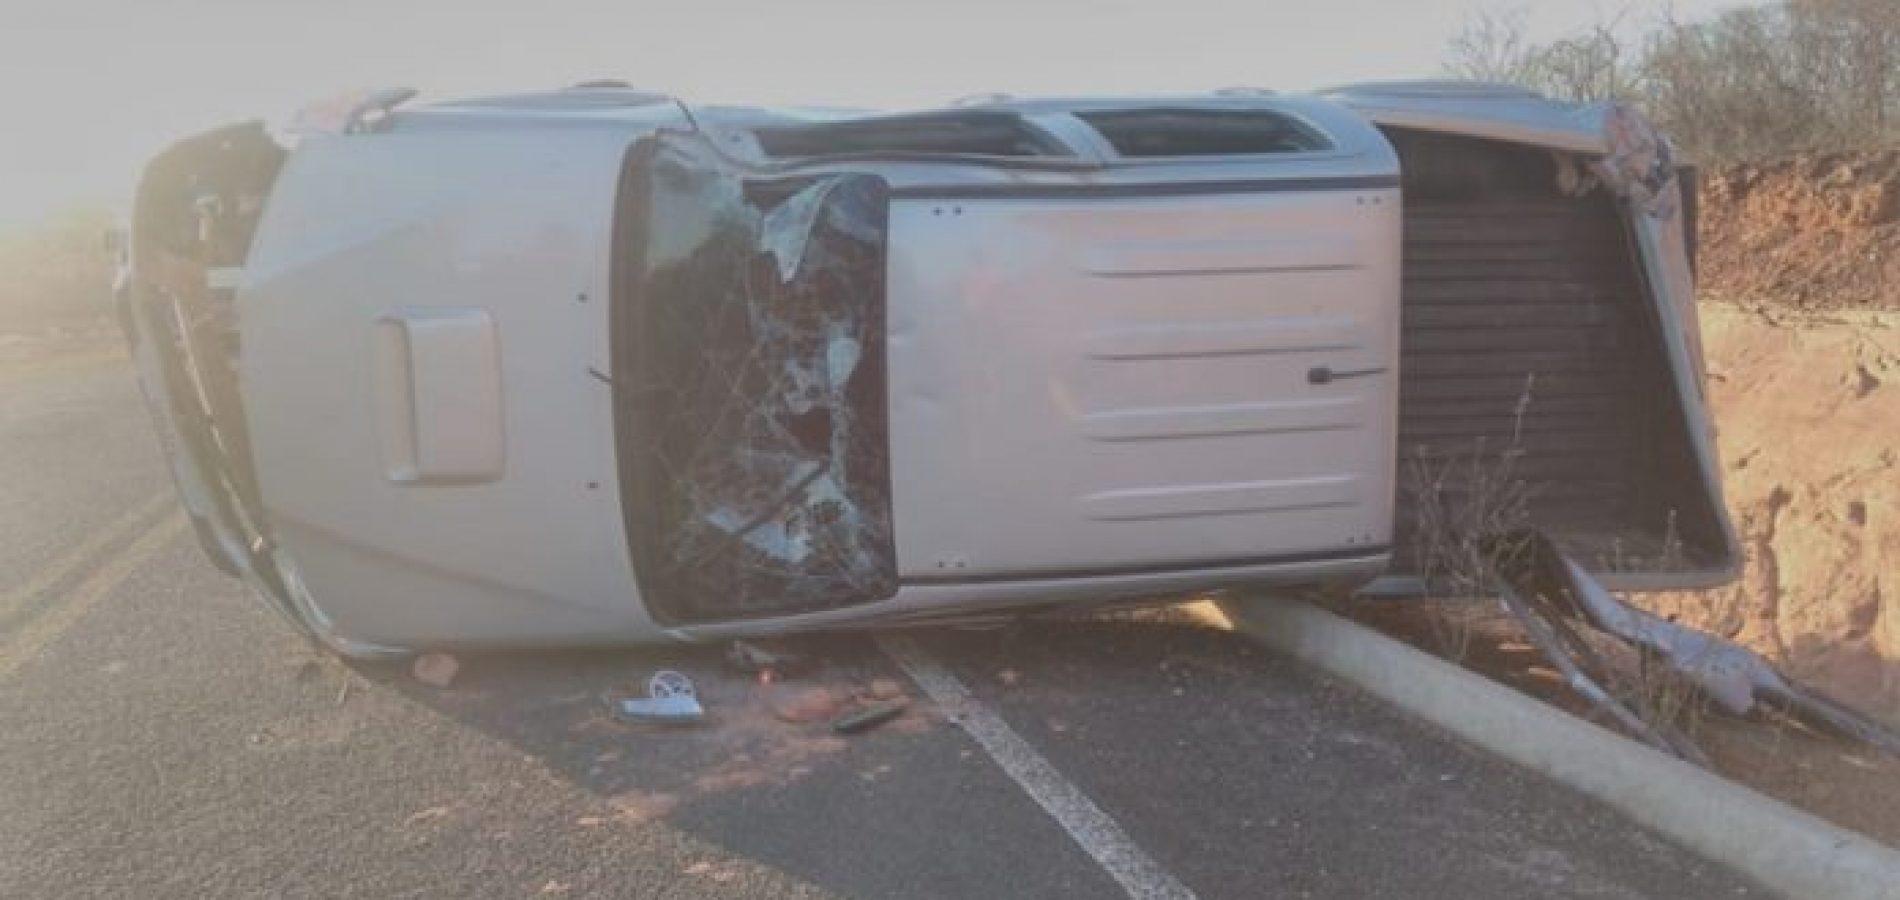 Motorista perde controle e capota caminhonete Hilux em curva na PI 245